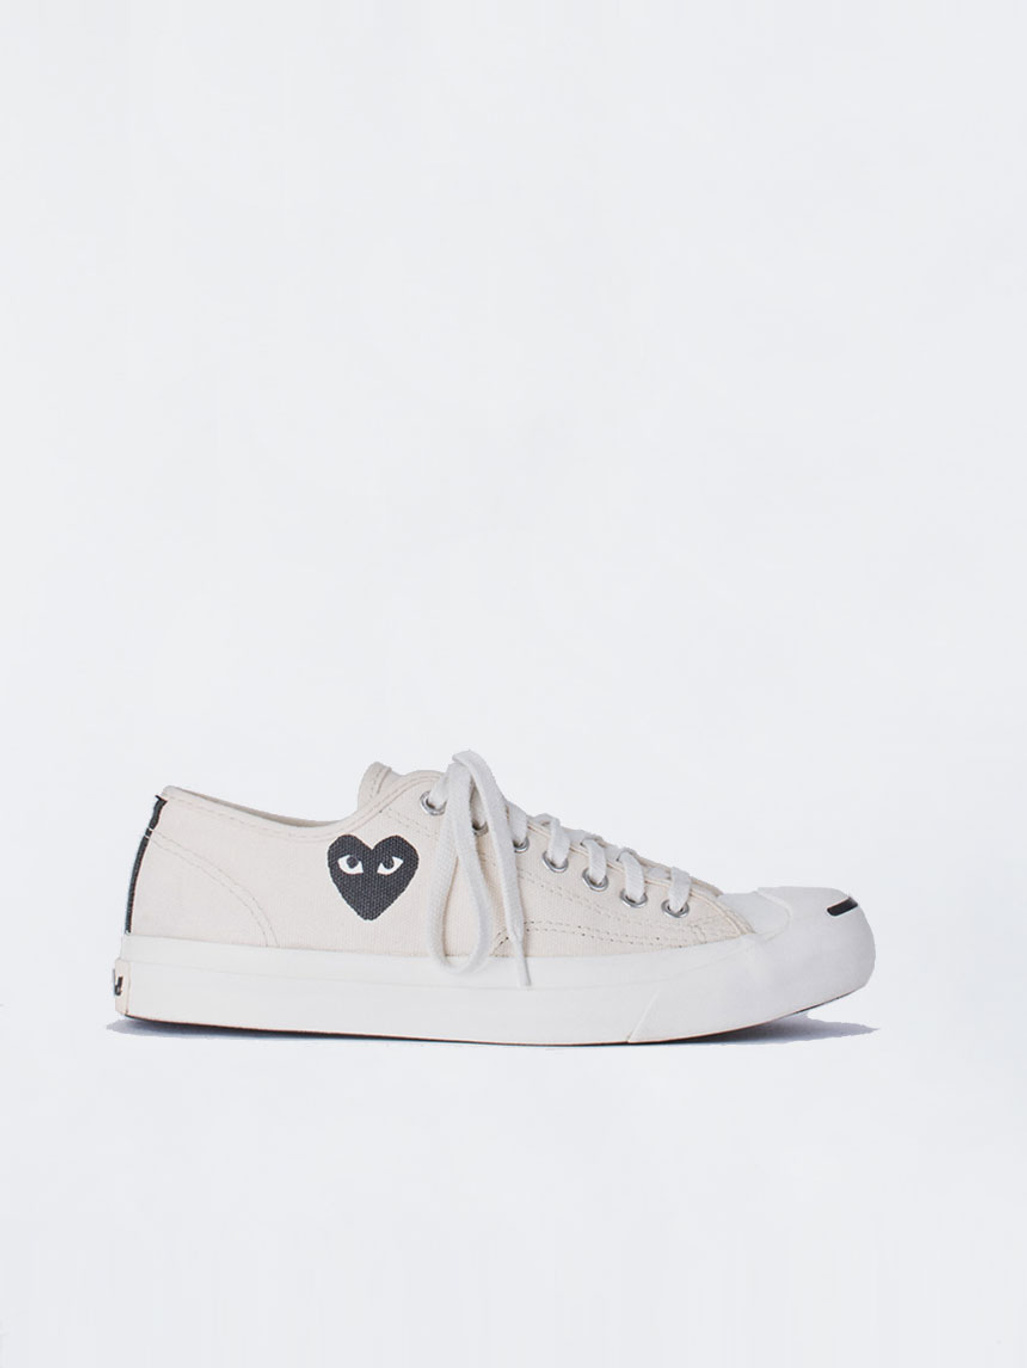 White Converse Sneakers Size 6 | Reebonz United Arab Emirates